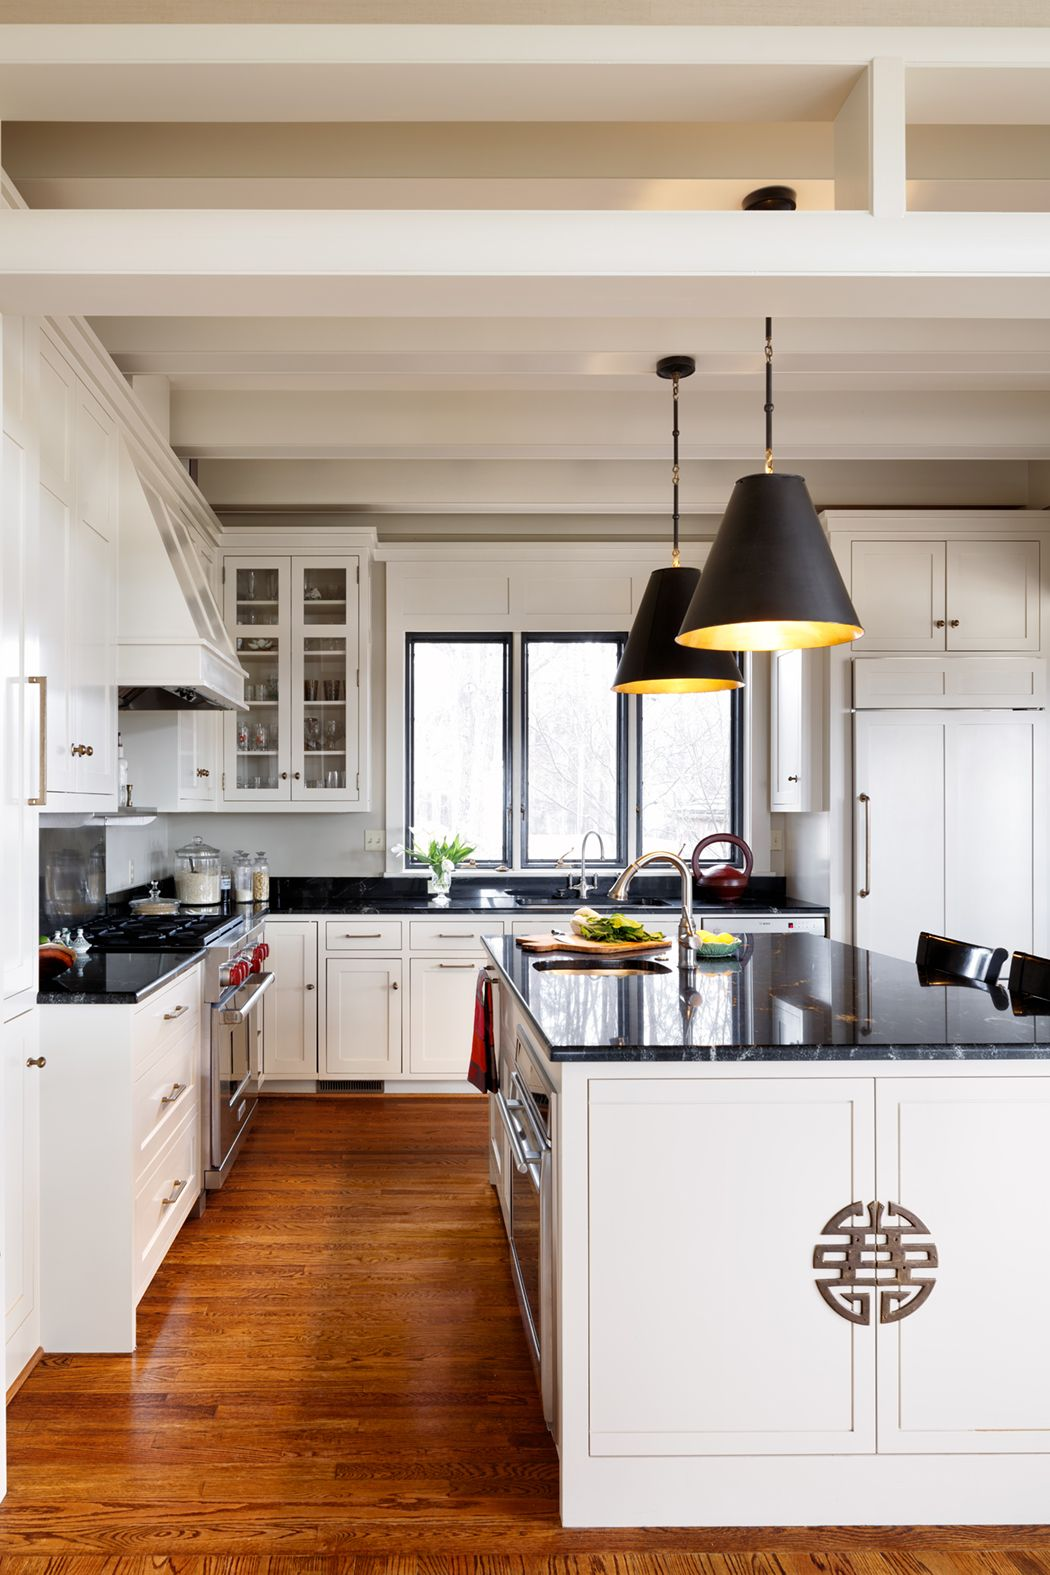 Pin by Milica Wren on Kitchen Kitchen, Home decor, Decor